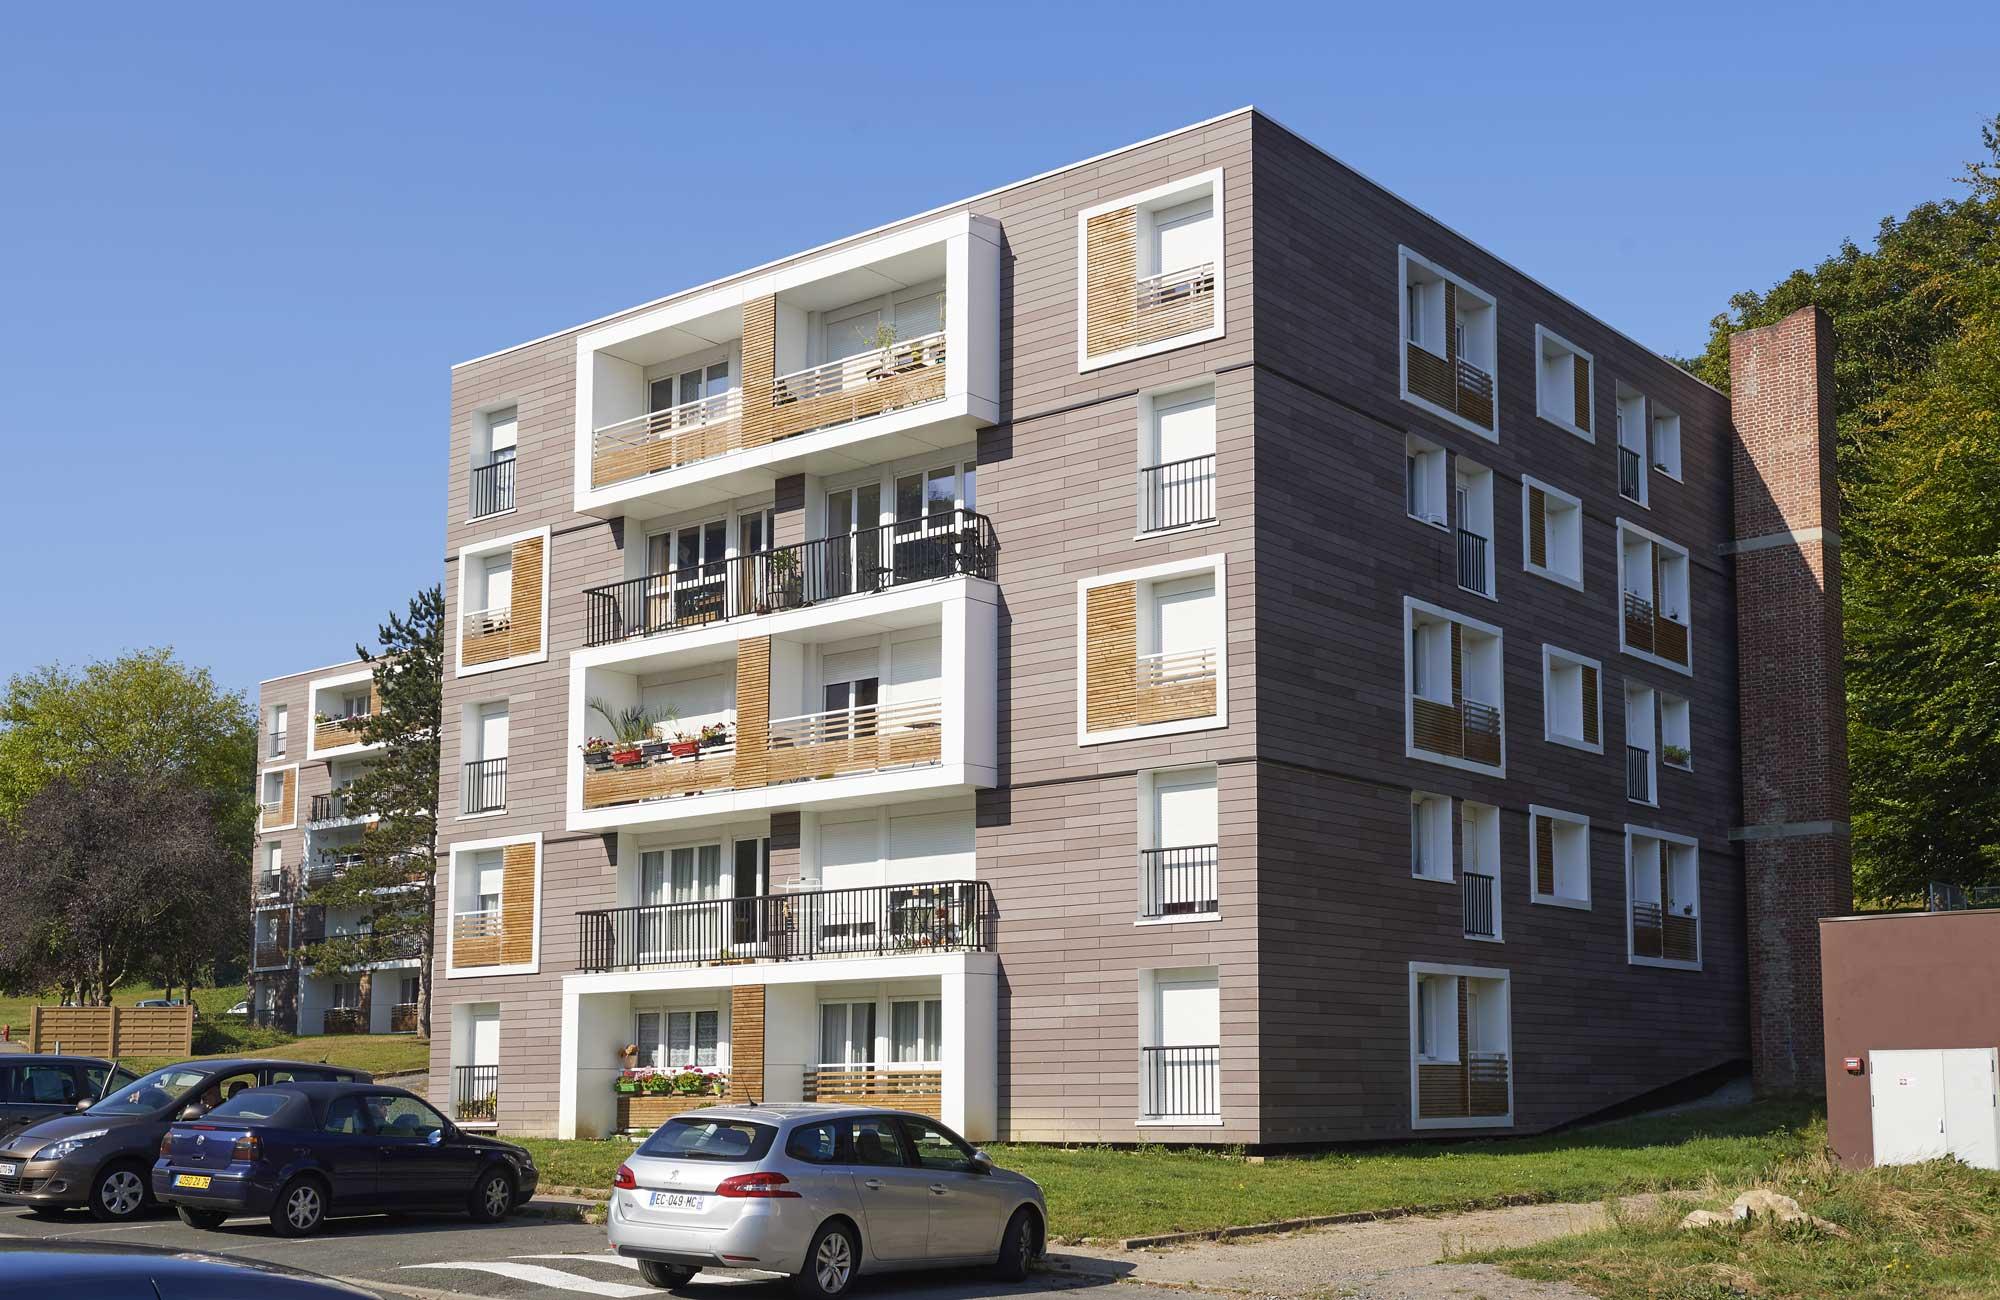 agence schneider caen architecte urbaniste normandie logements rehabilitation facade thermique. Black Bedroom Furniture Sets. Home Design Ideas